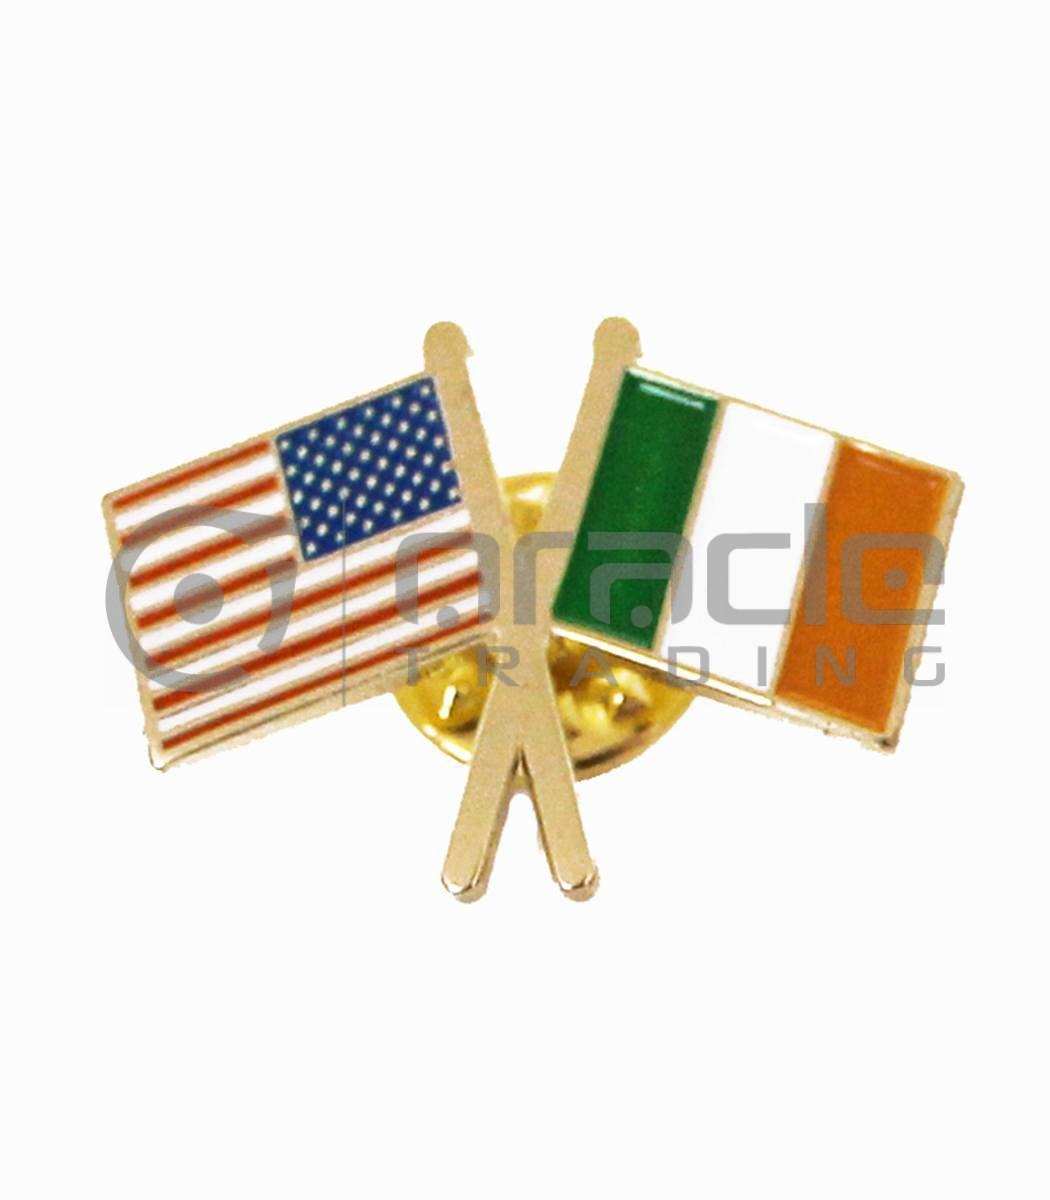 Ireland / USA Friendship Lapel Pin